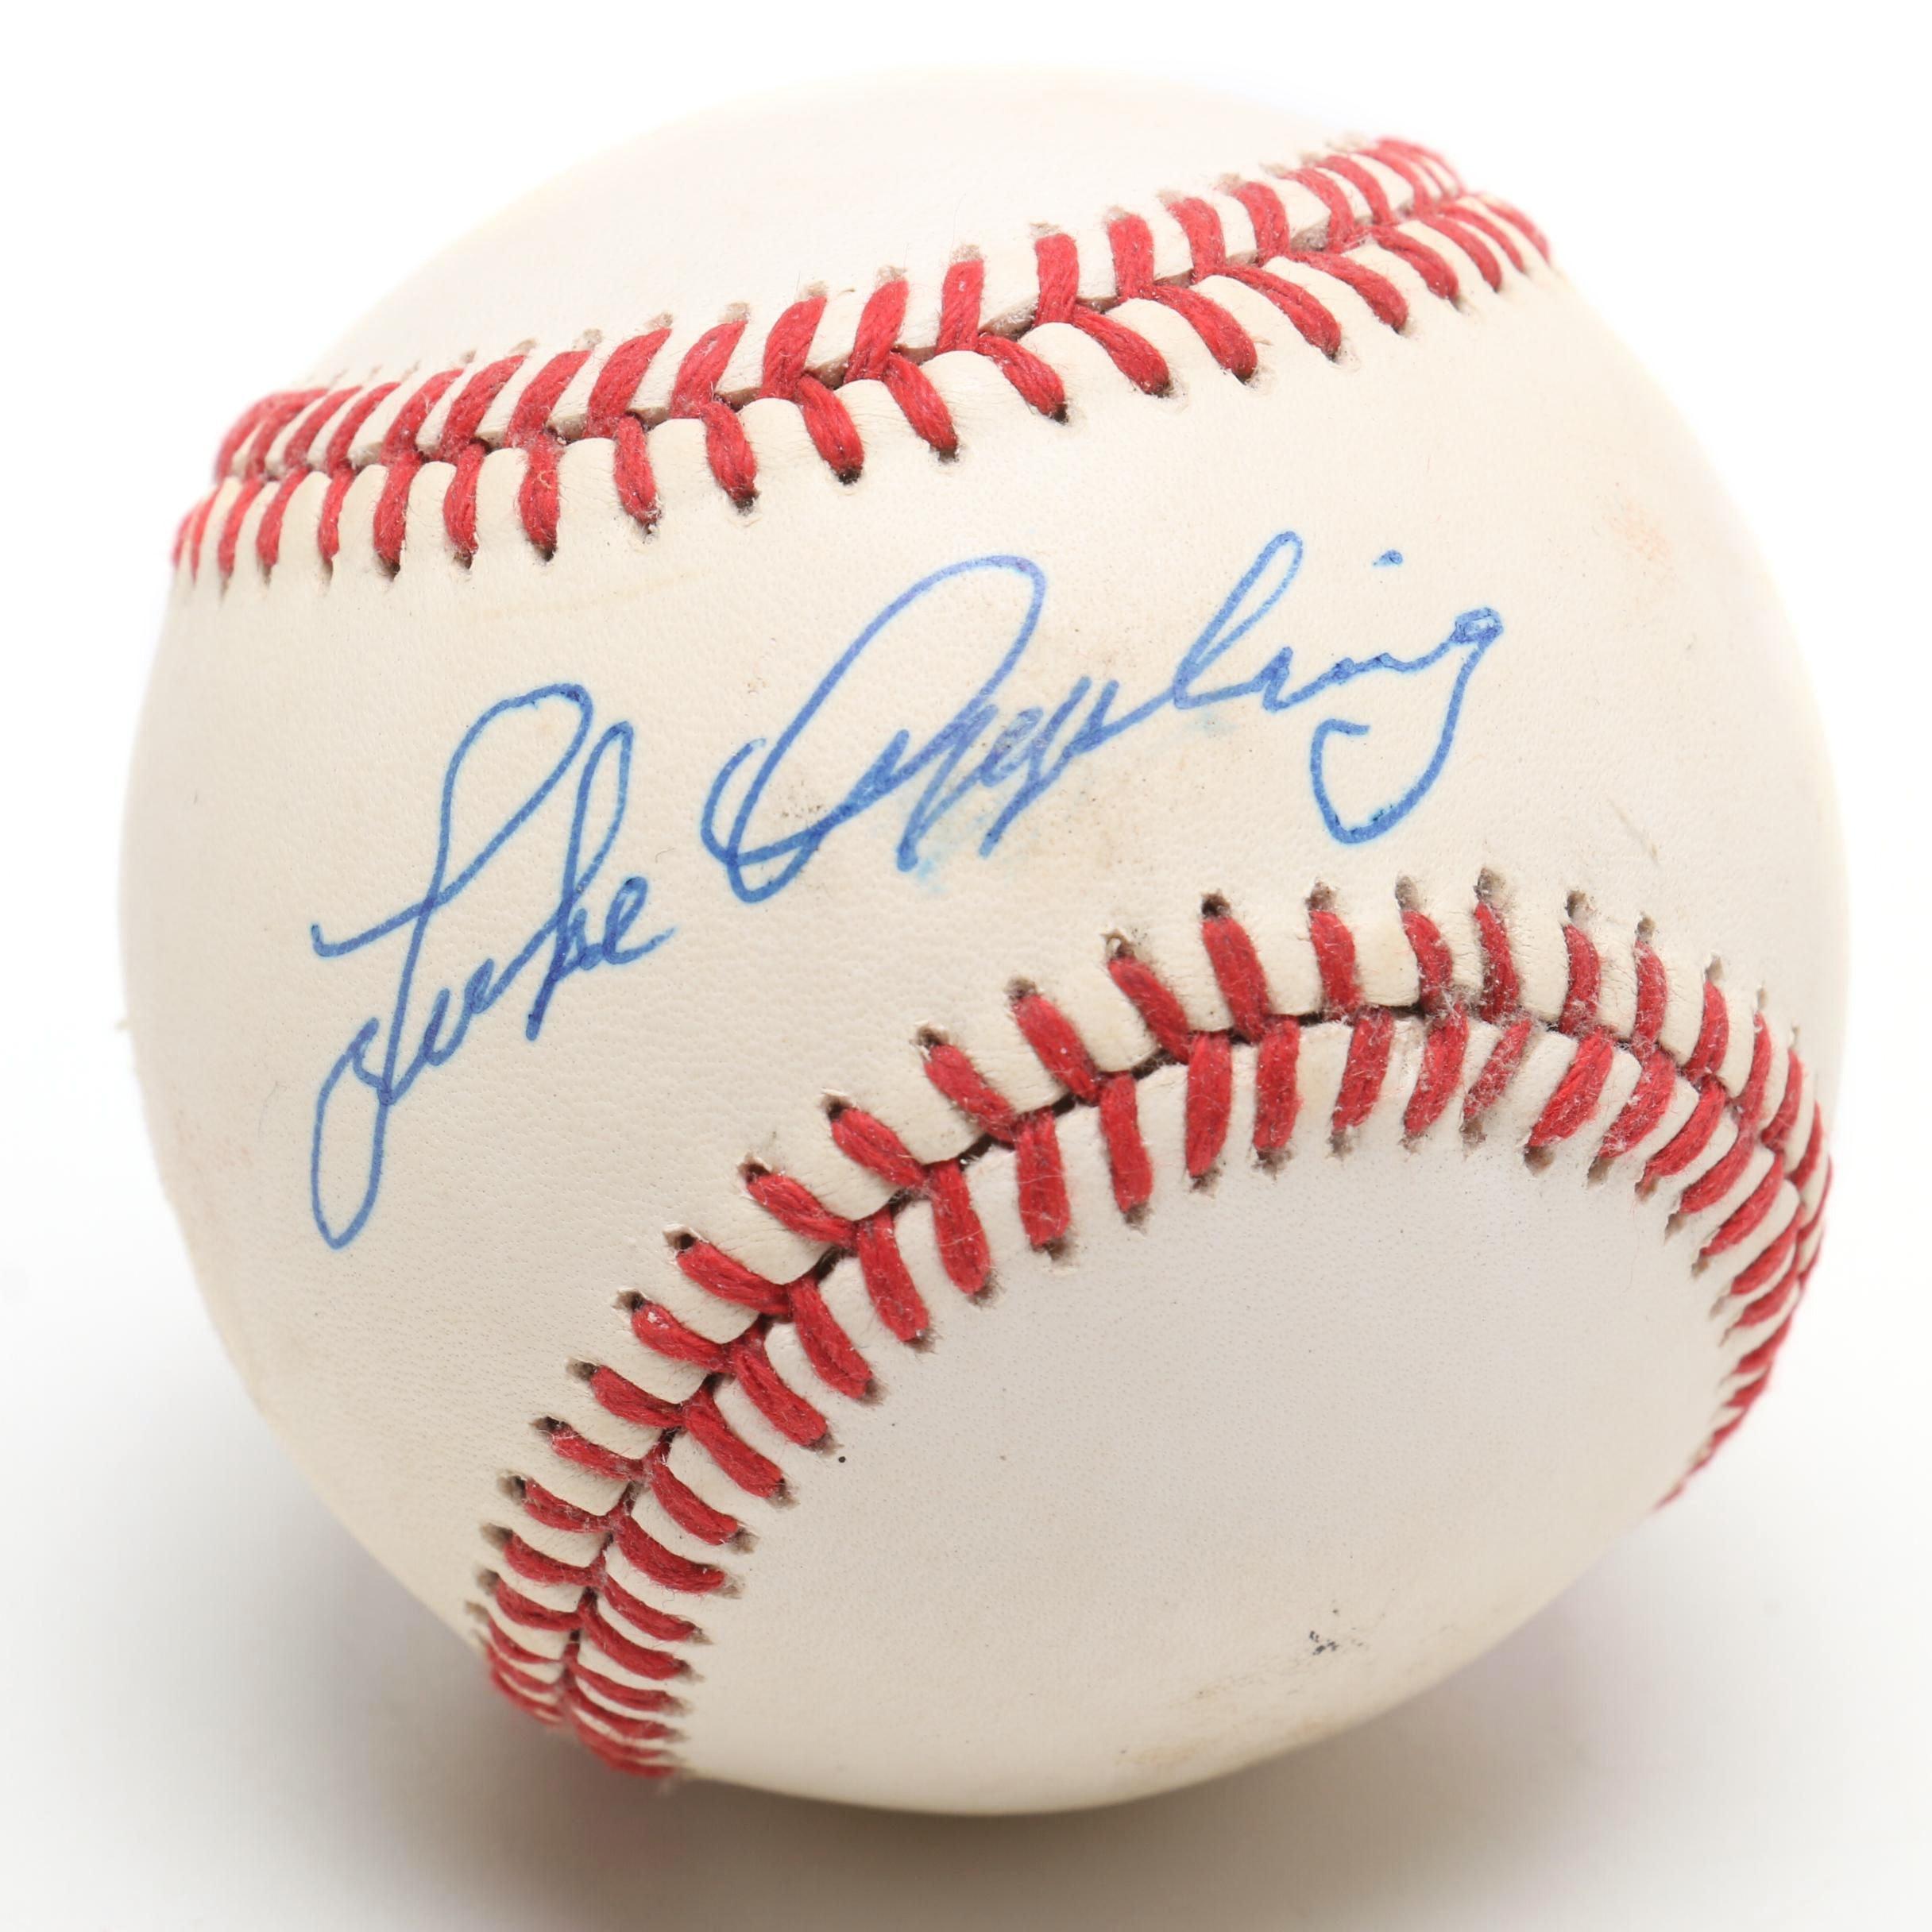 (HOF) Luke Appling Signed Rawlings AL Baseball